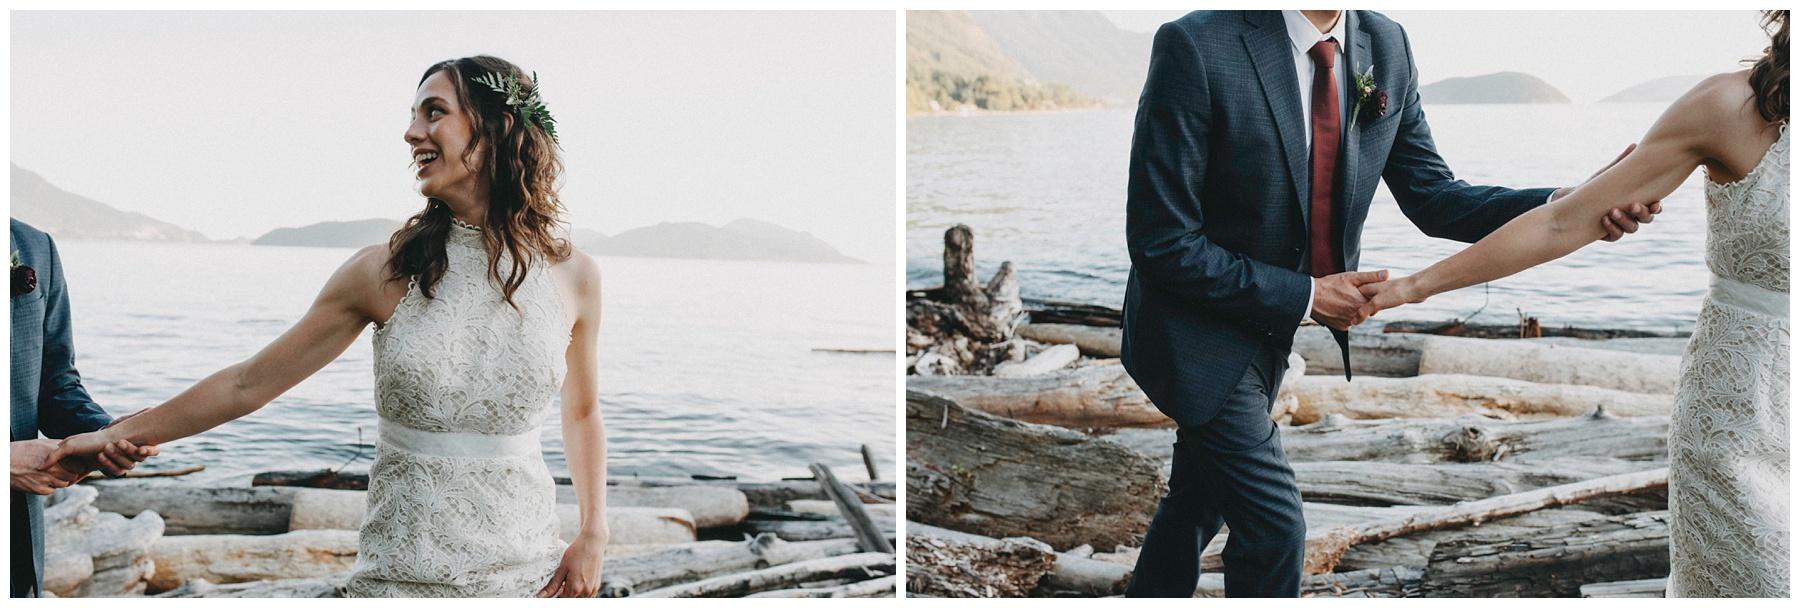 Vancouver intimate Wedding Photographer_0552.jpg